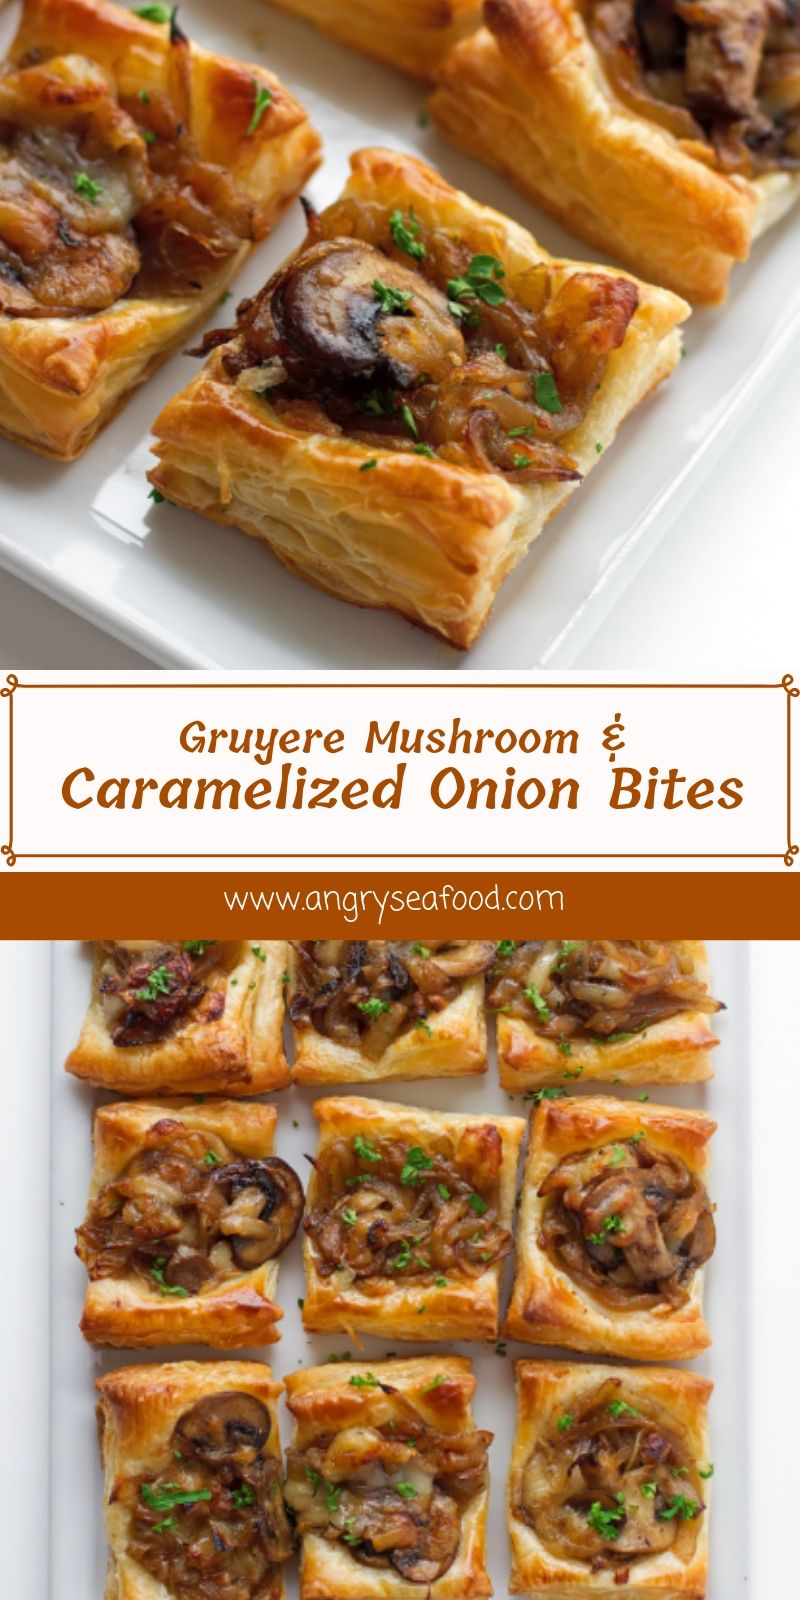 Gruyere Mushroom & Caramelized Onion Bites